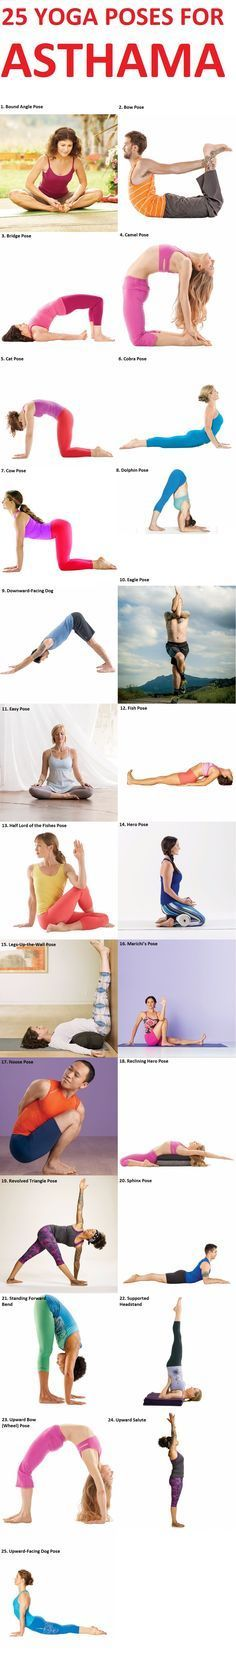 Yoga Poses to Treat Asthama